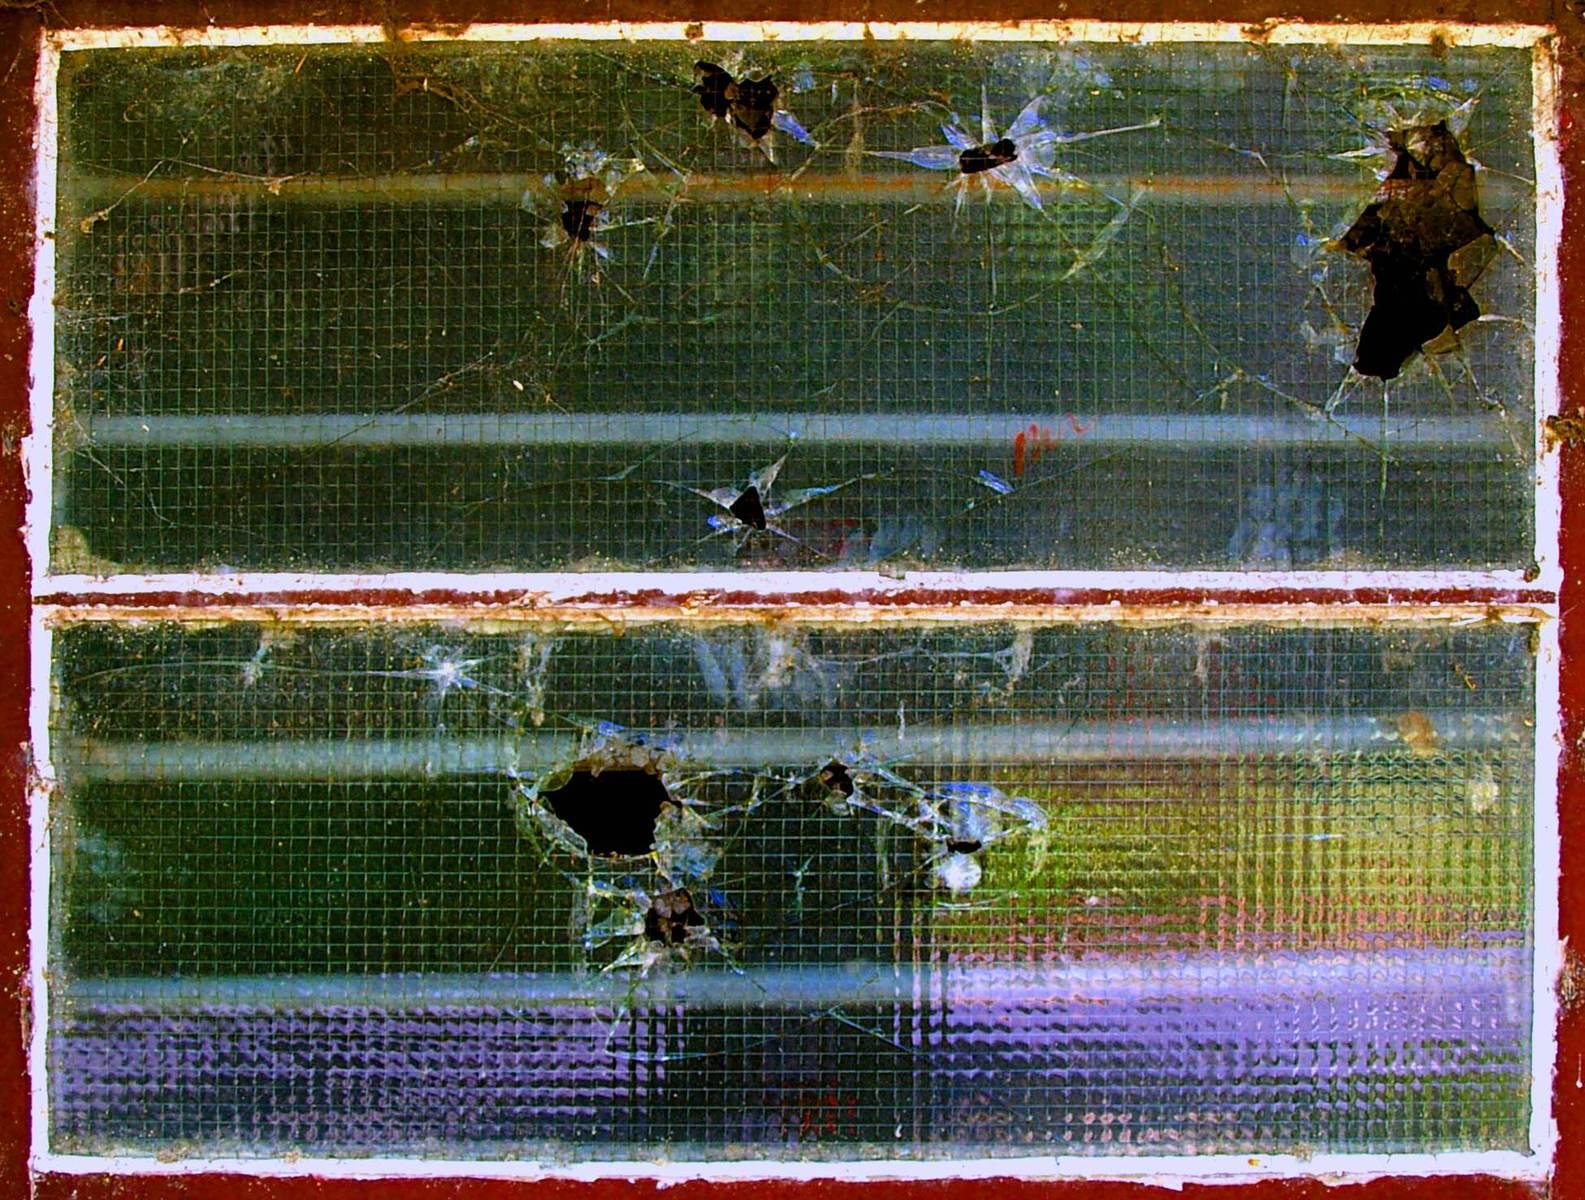 free 被打碎的窗户 2 stock photo